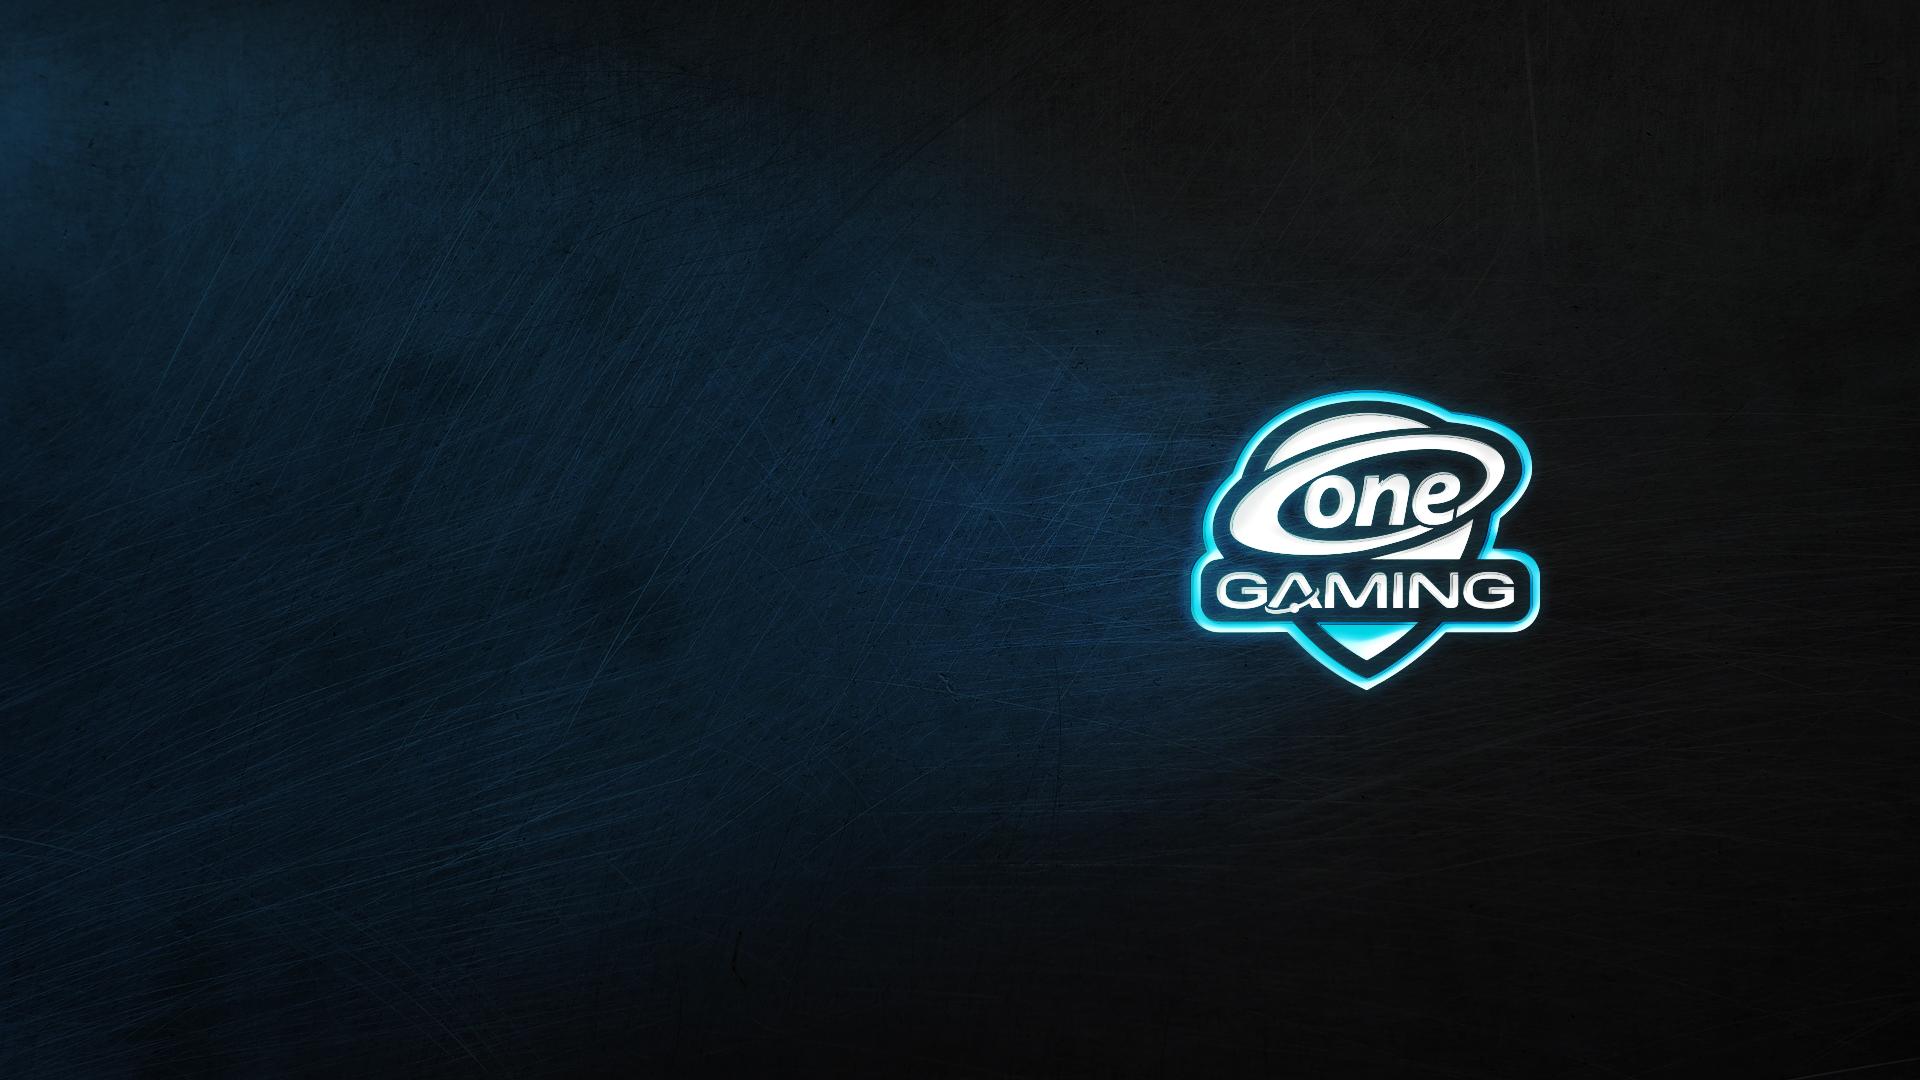 ONE Gaming Wallpaper Steel